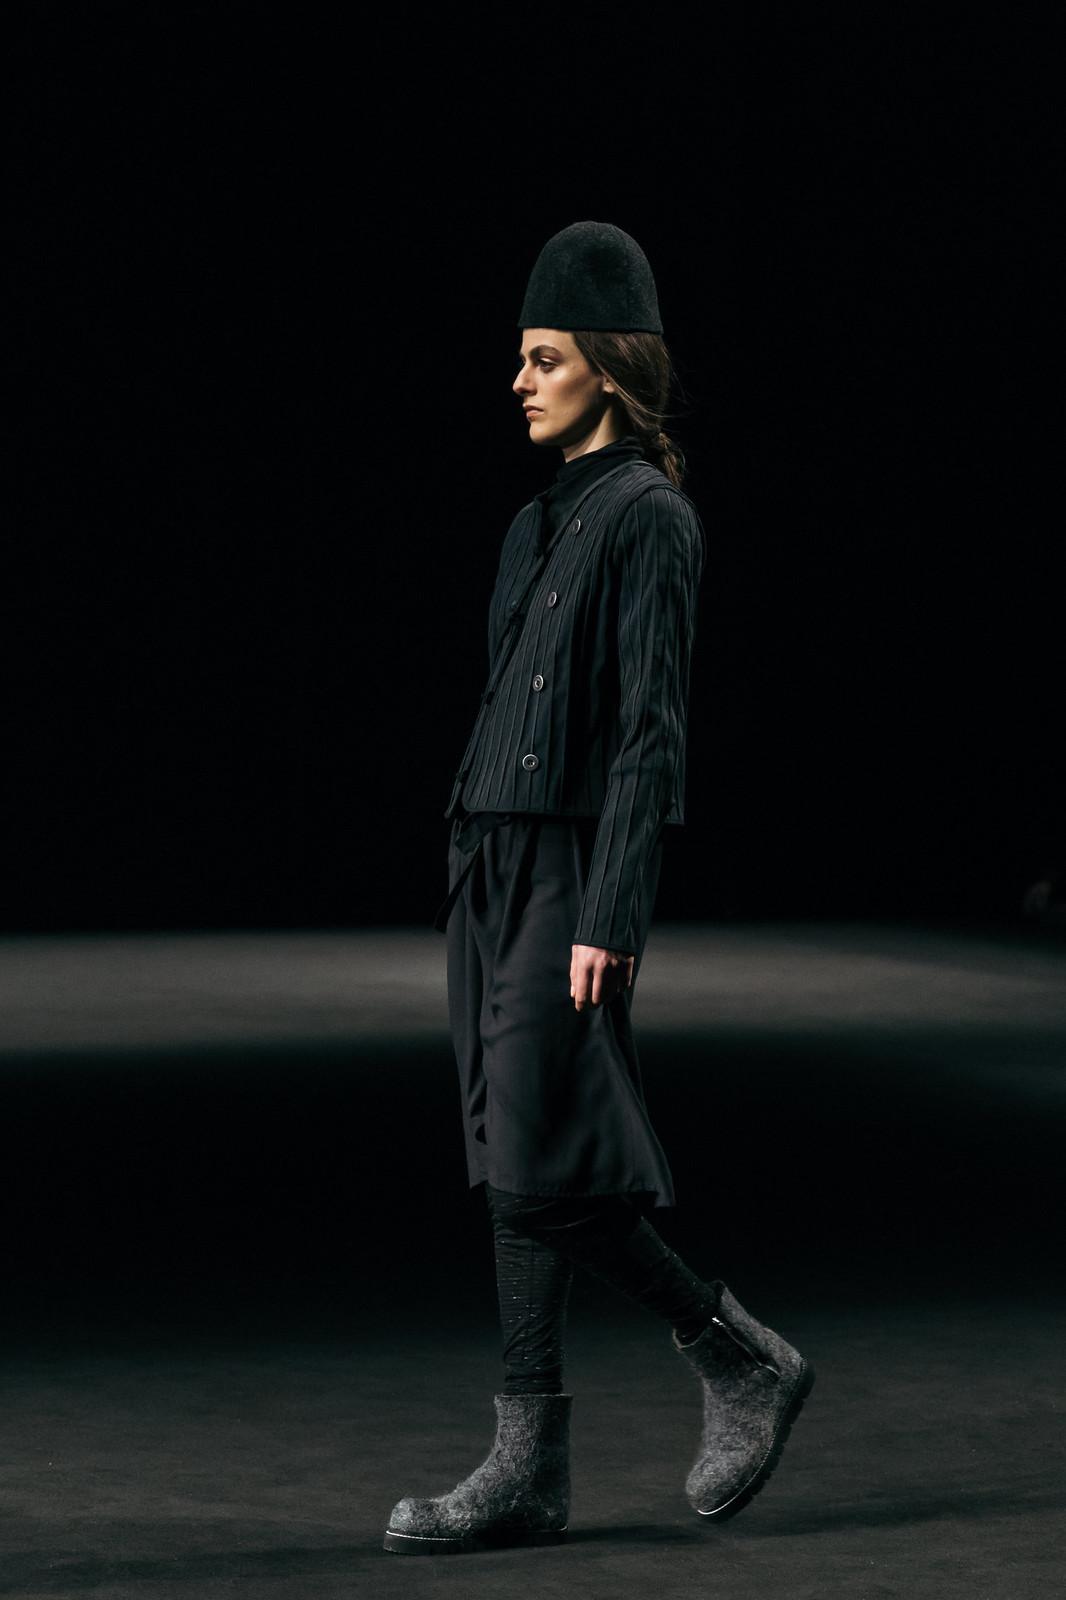 Jessie Chanes - Seams for a desire - 080 Bacelona Fashion #080bcnfasion -28